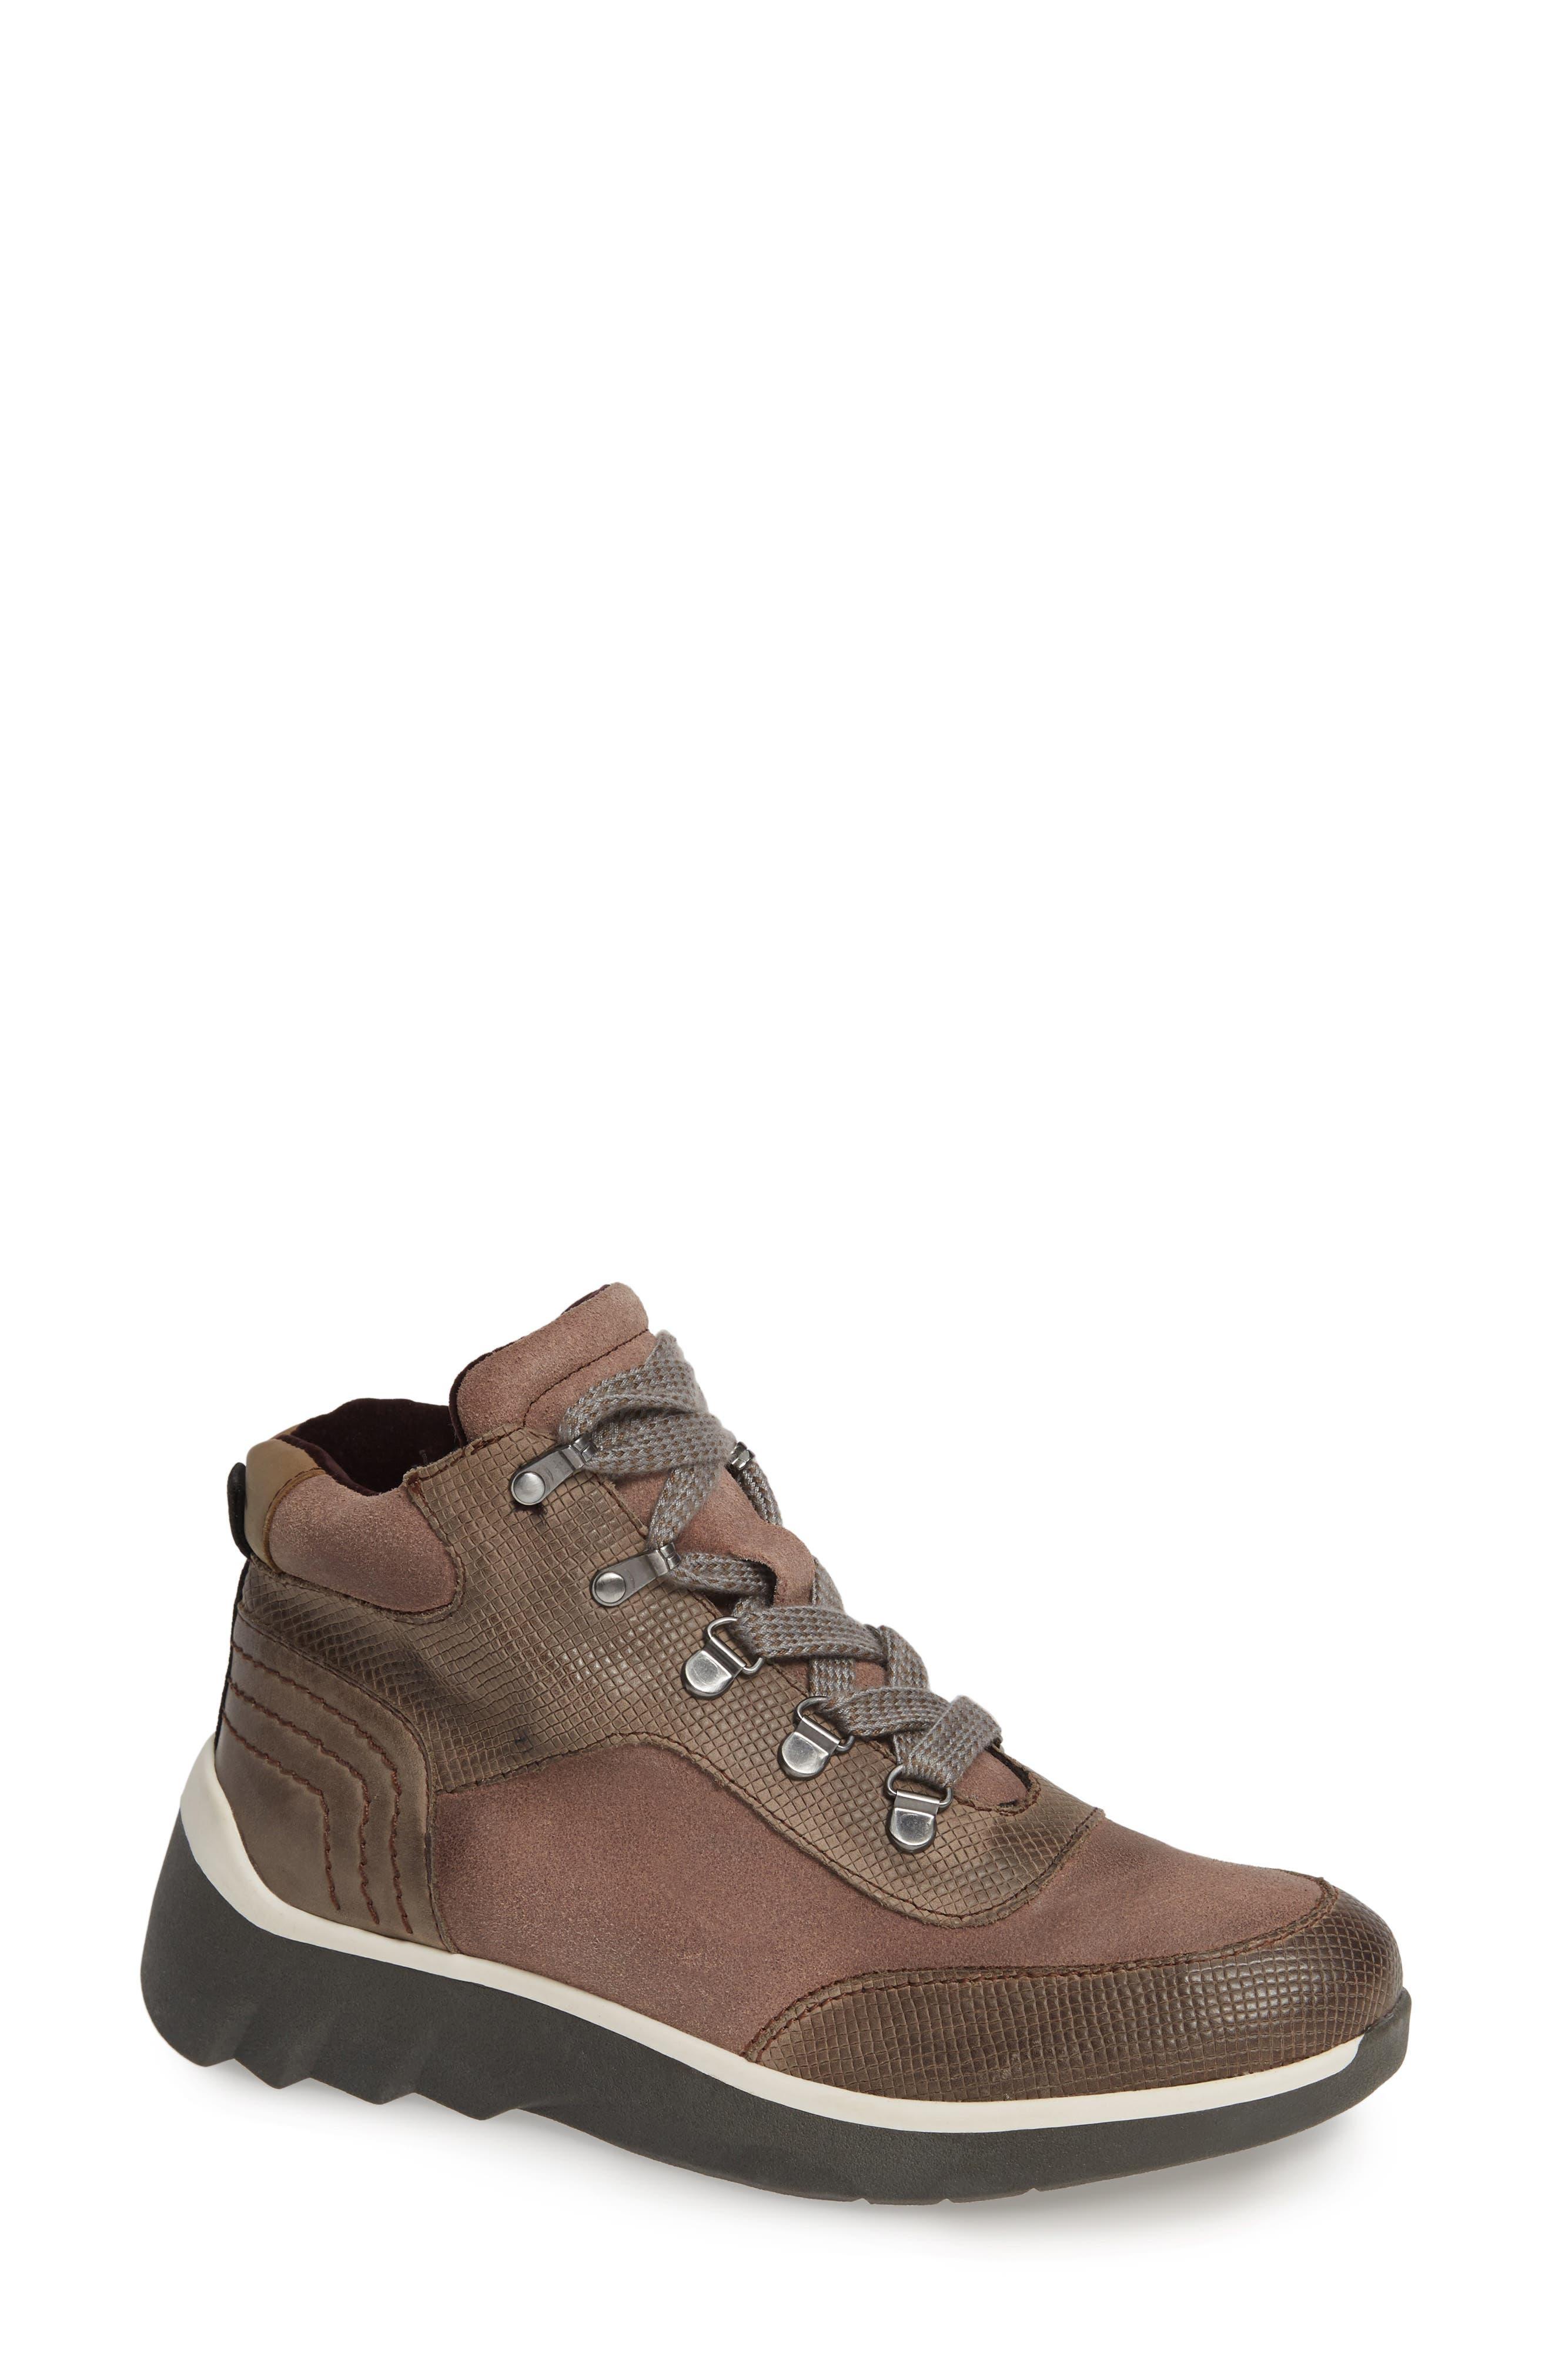 Commuter Sneaker,                         Main,                         color, CINDER LEATHER